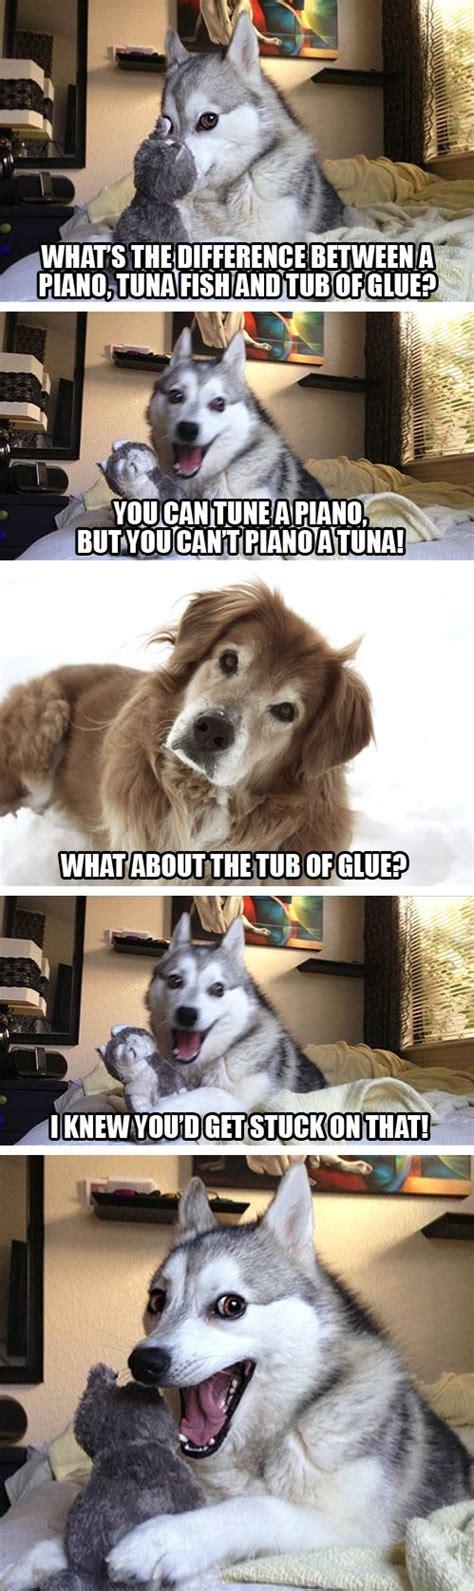 Funny Husky Memes - meme watch pun dog isn t fat he s just a little husky pun dog pun husky and meme